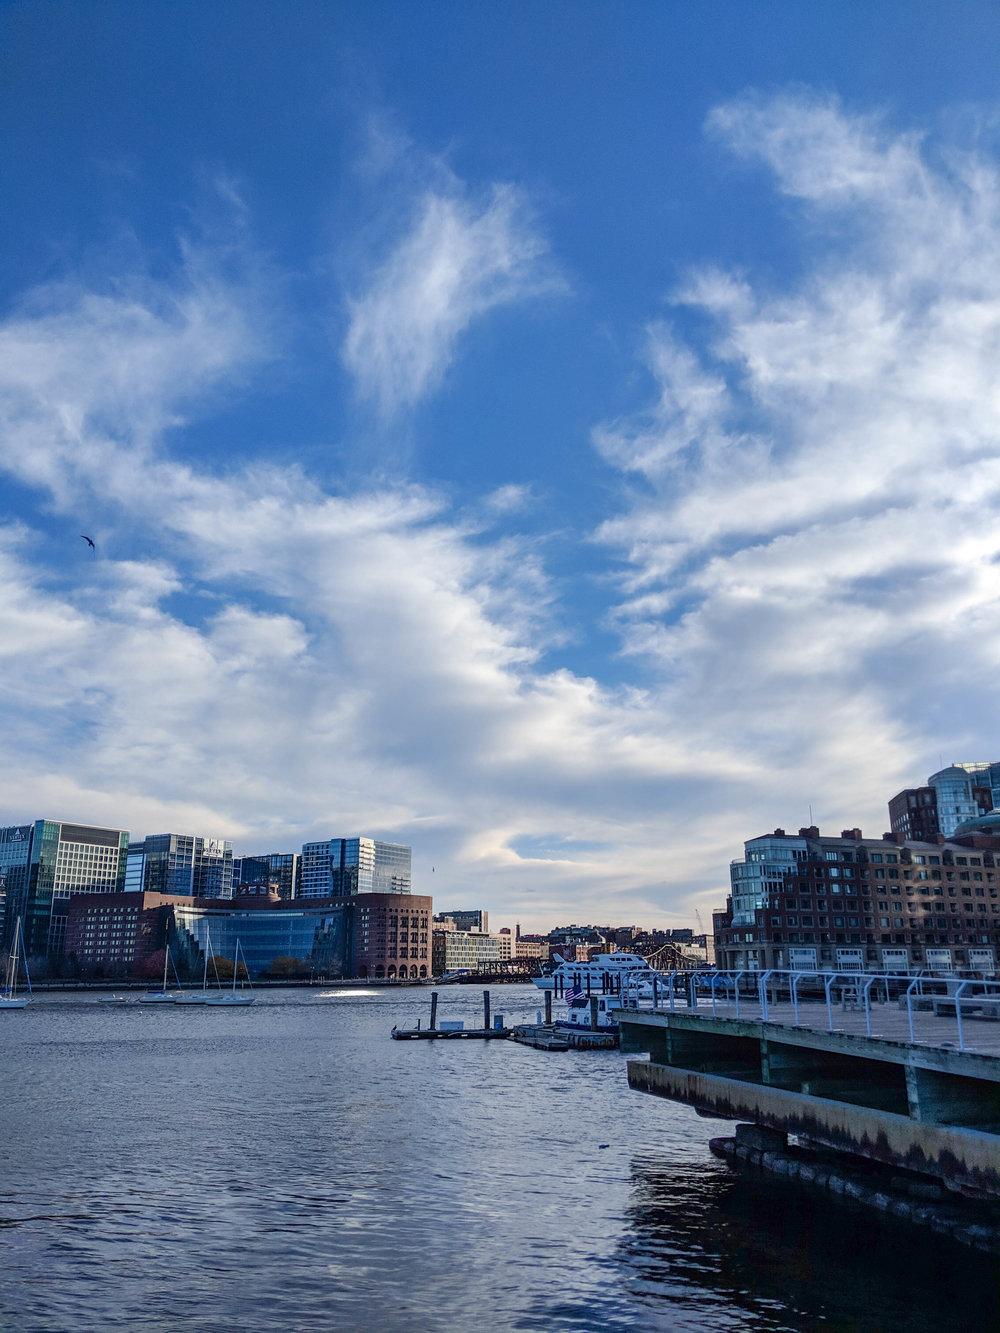 bri rinehart; photography; boson; harbor; wharf; boats; outside